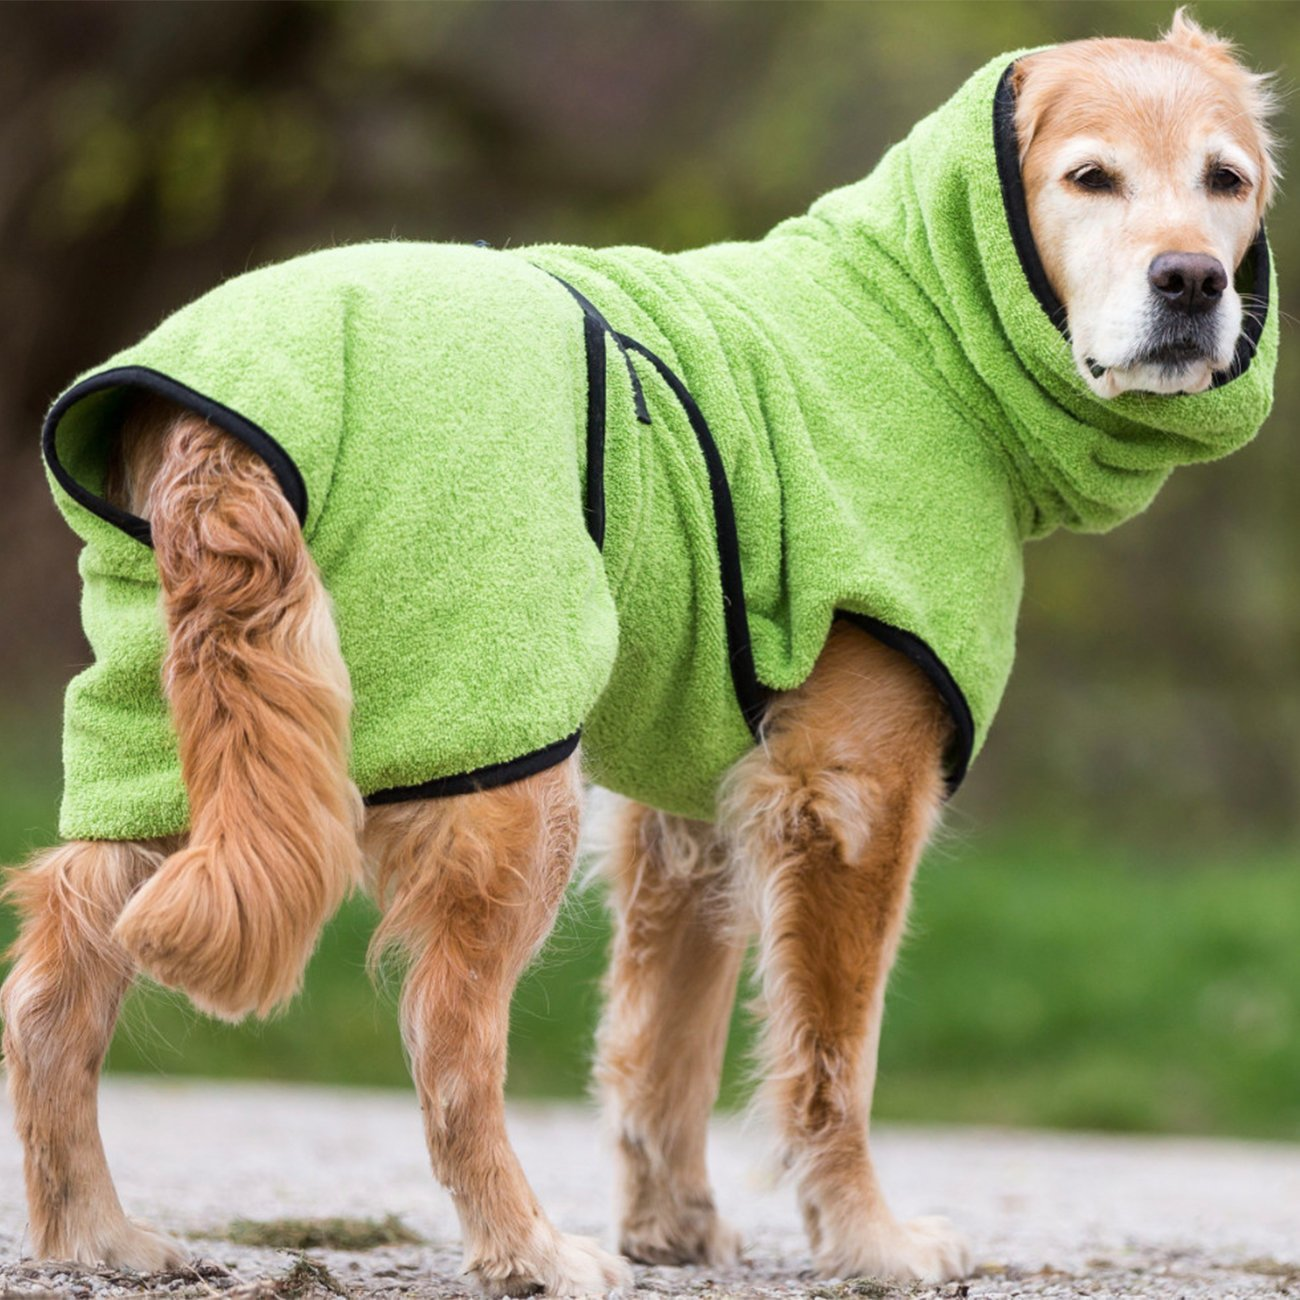 fit4dogs Trockenmantel Hund Dryup Cape, Bild 2